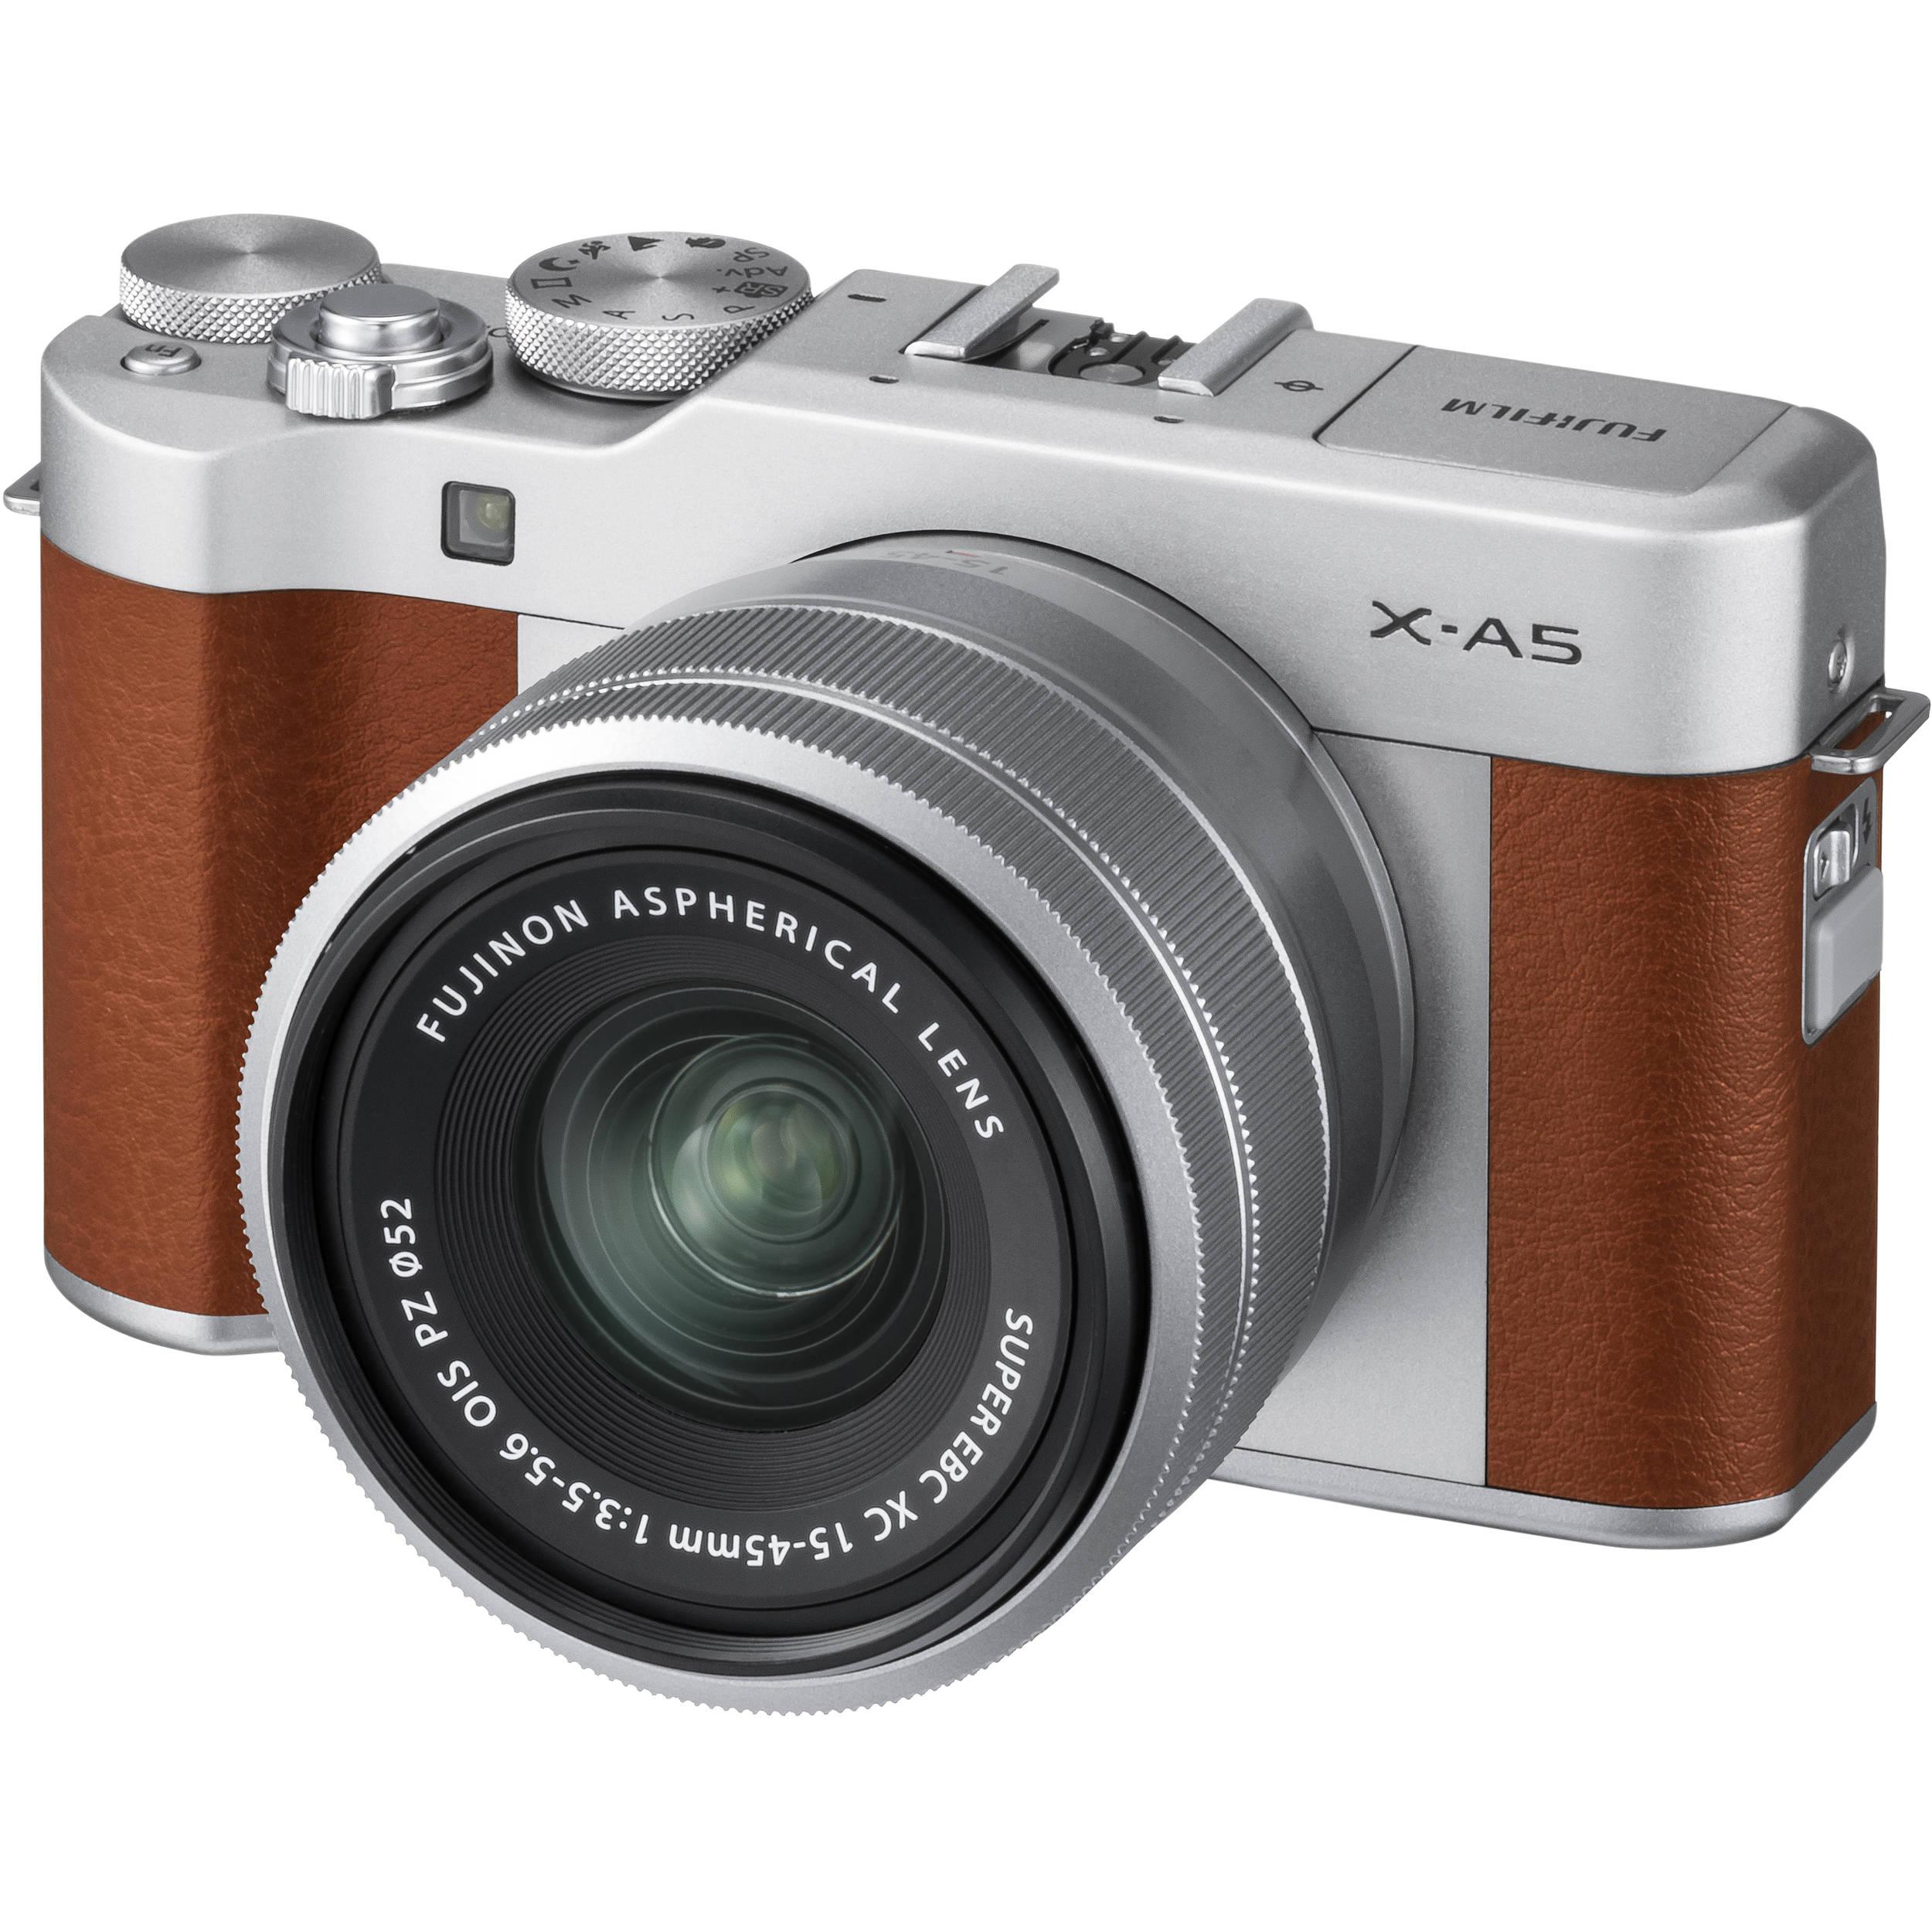 FUJIFILM X-A5 Mirrorless Digital Camera with 15-45mm 16568913